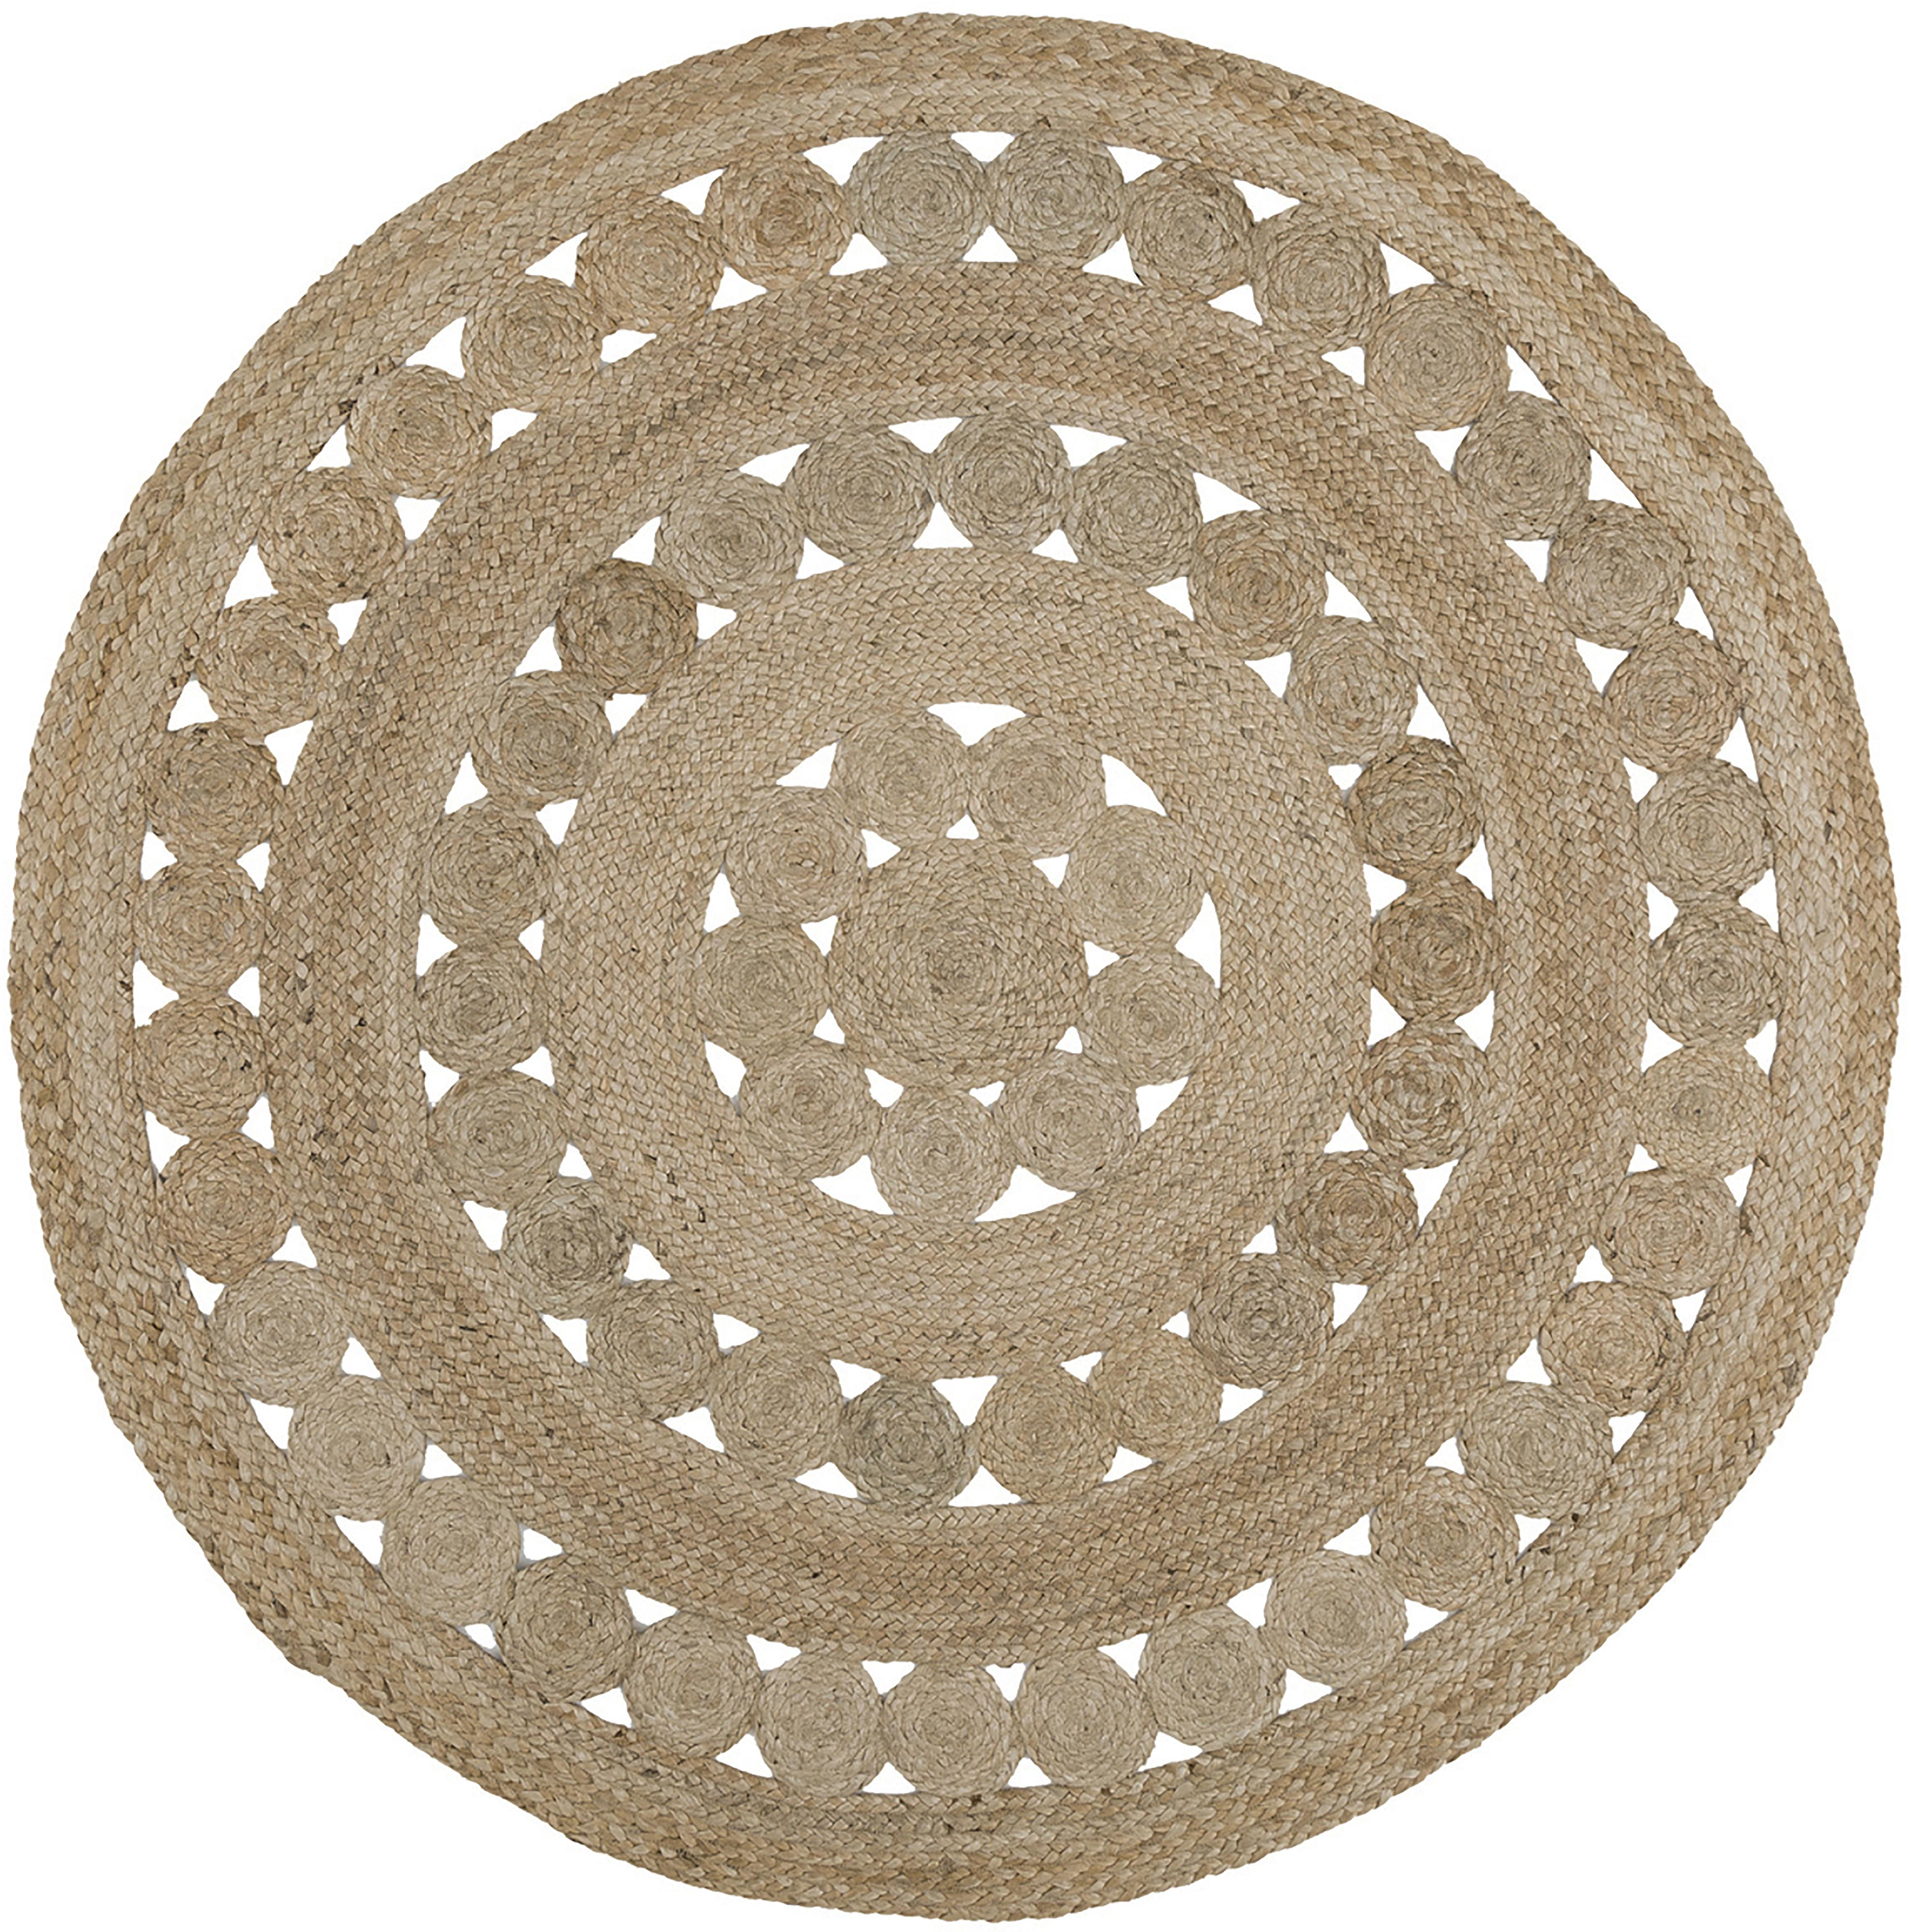 Runder Jute-Teppich Shyam im Boho Style, handgefertigt, Jute, Ø 150 cm (Grösse M)